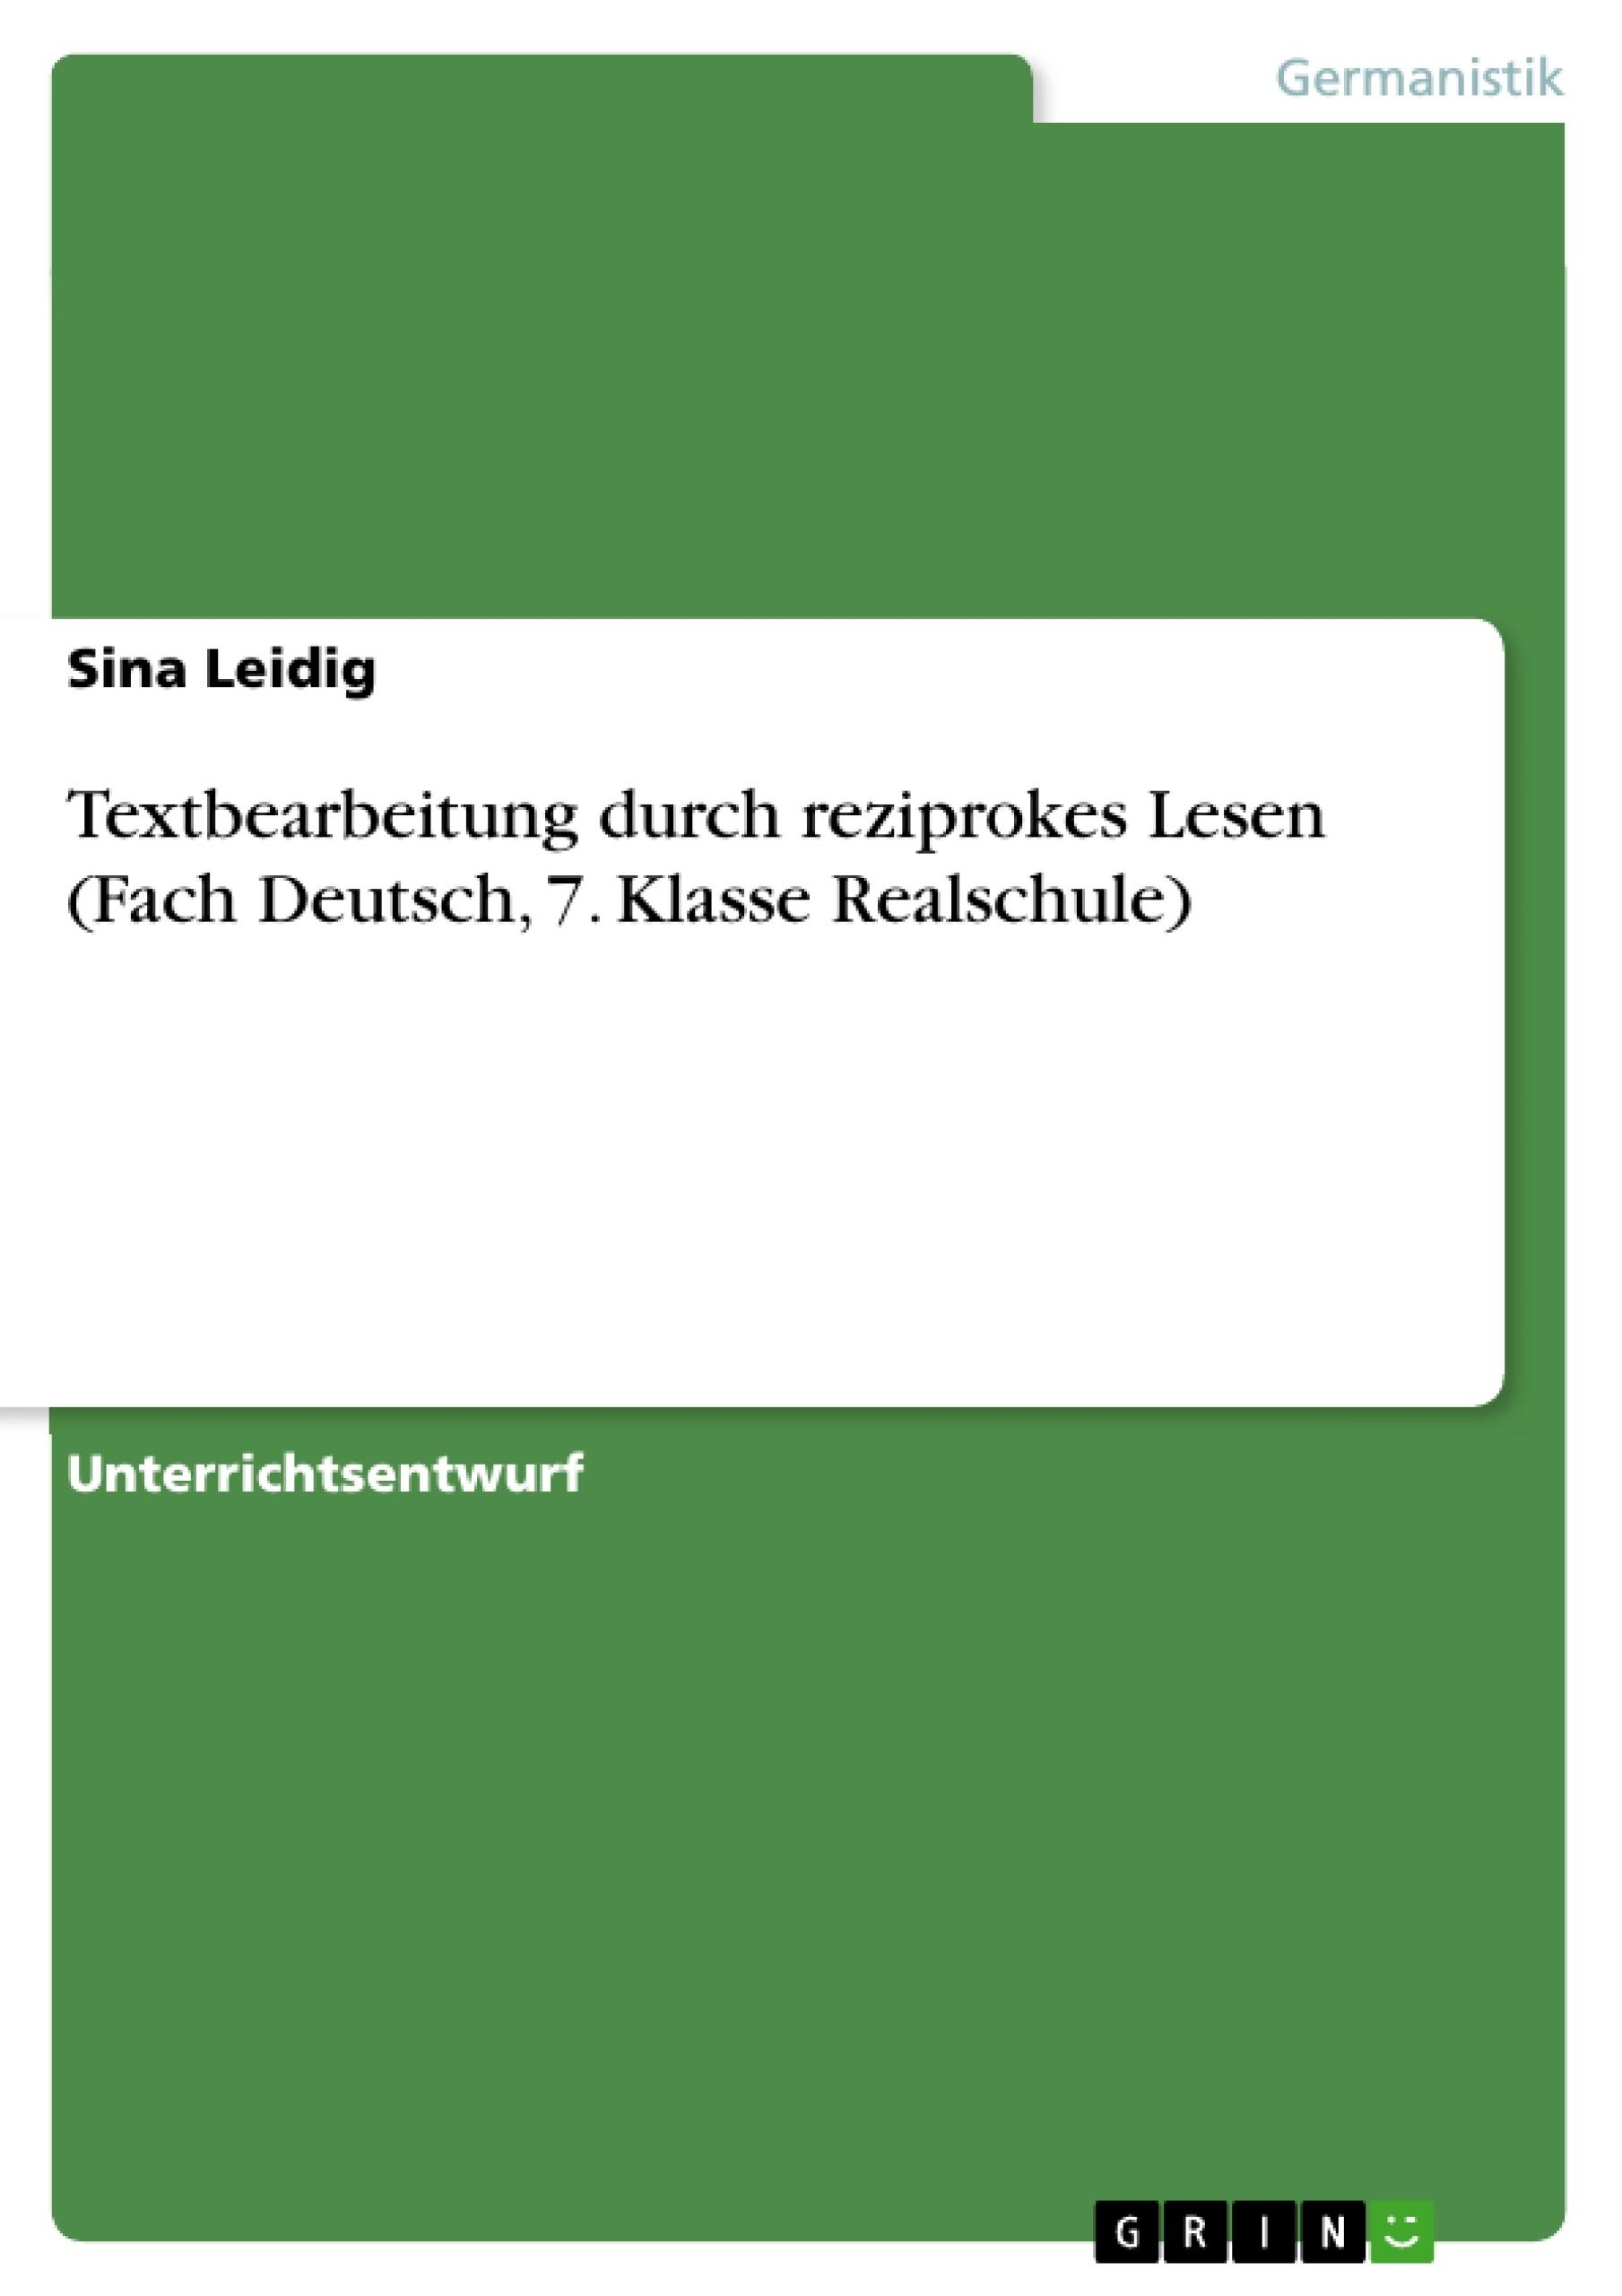 Titel: Textbearbeitung durch reziprokes Lesen (Fach Deutsch, 7. Klasse Realschule)